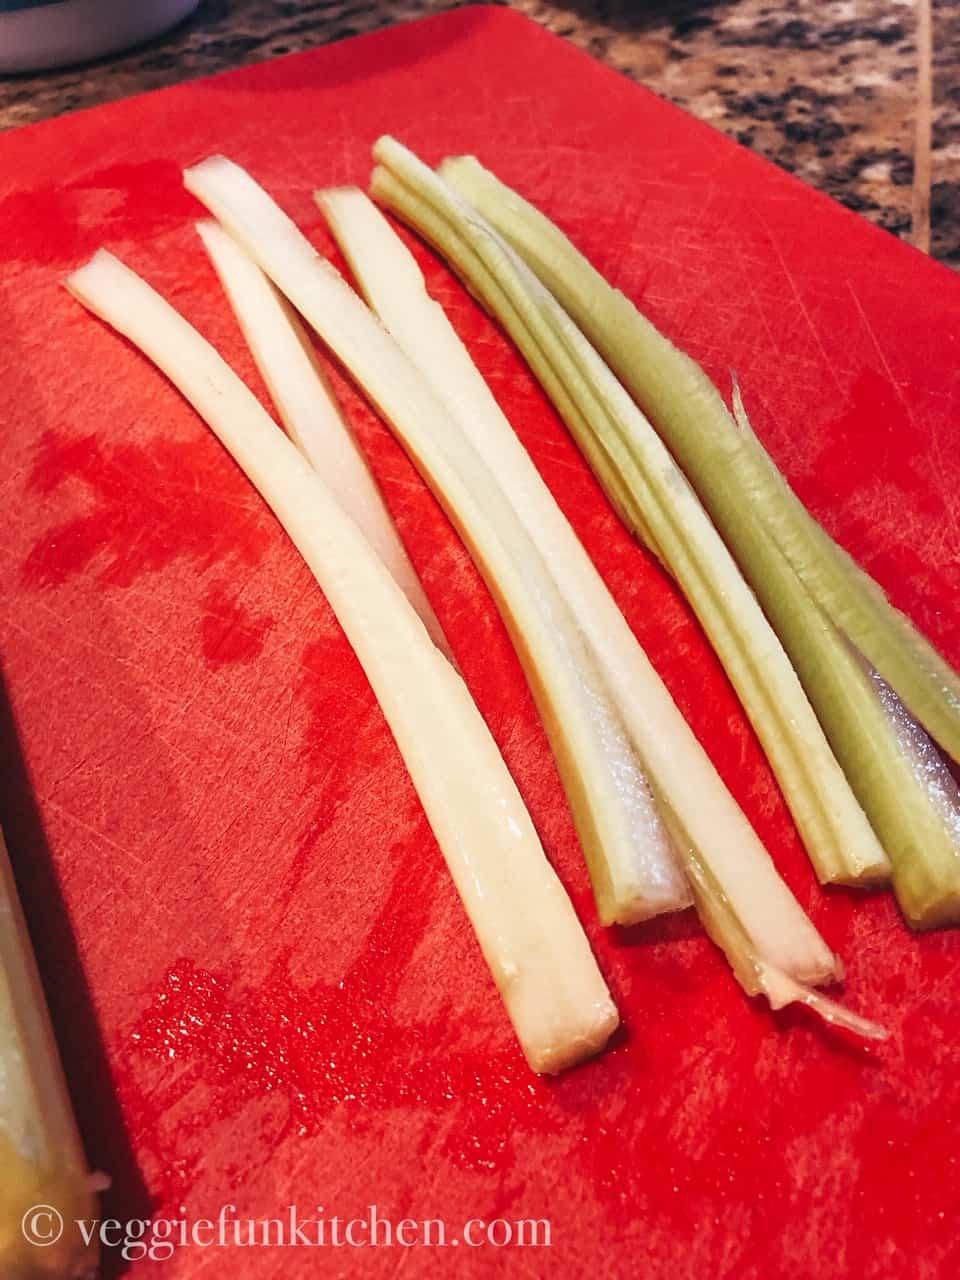 sliced celery lengthwise